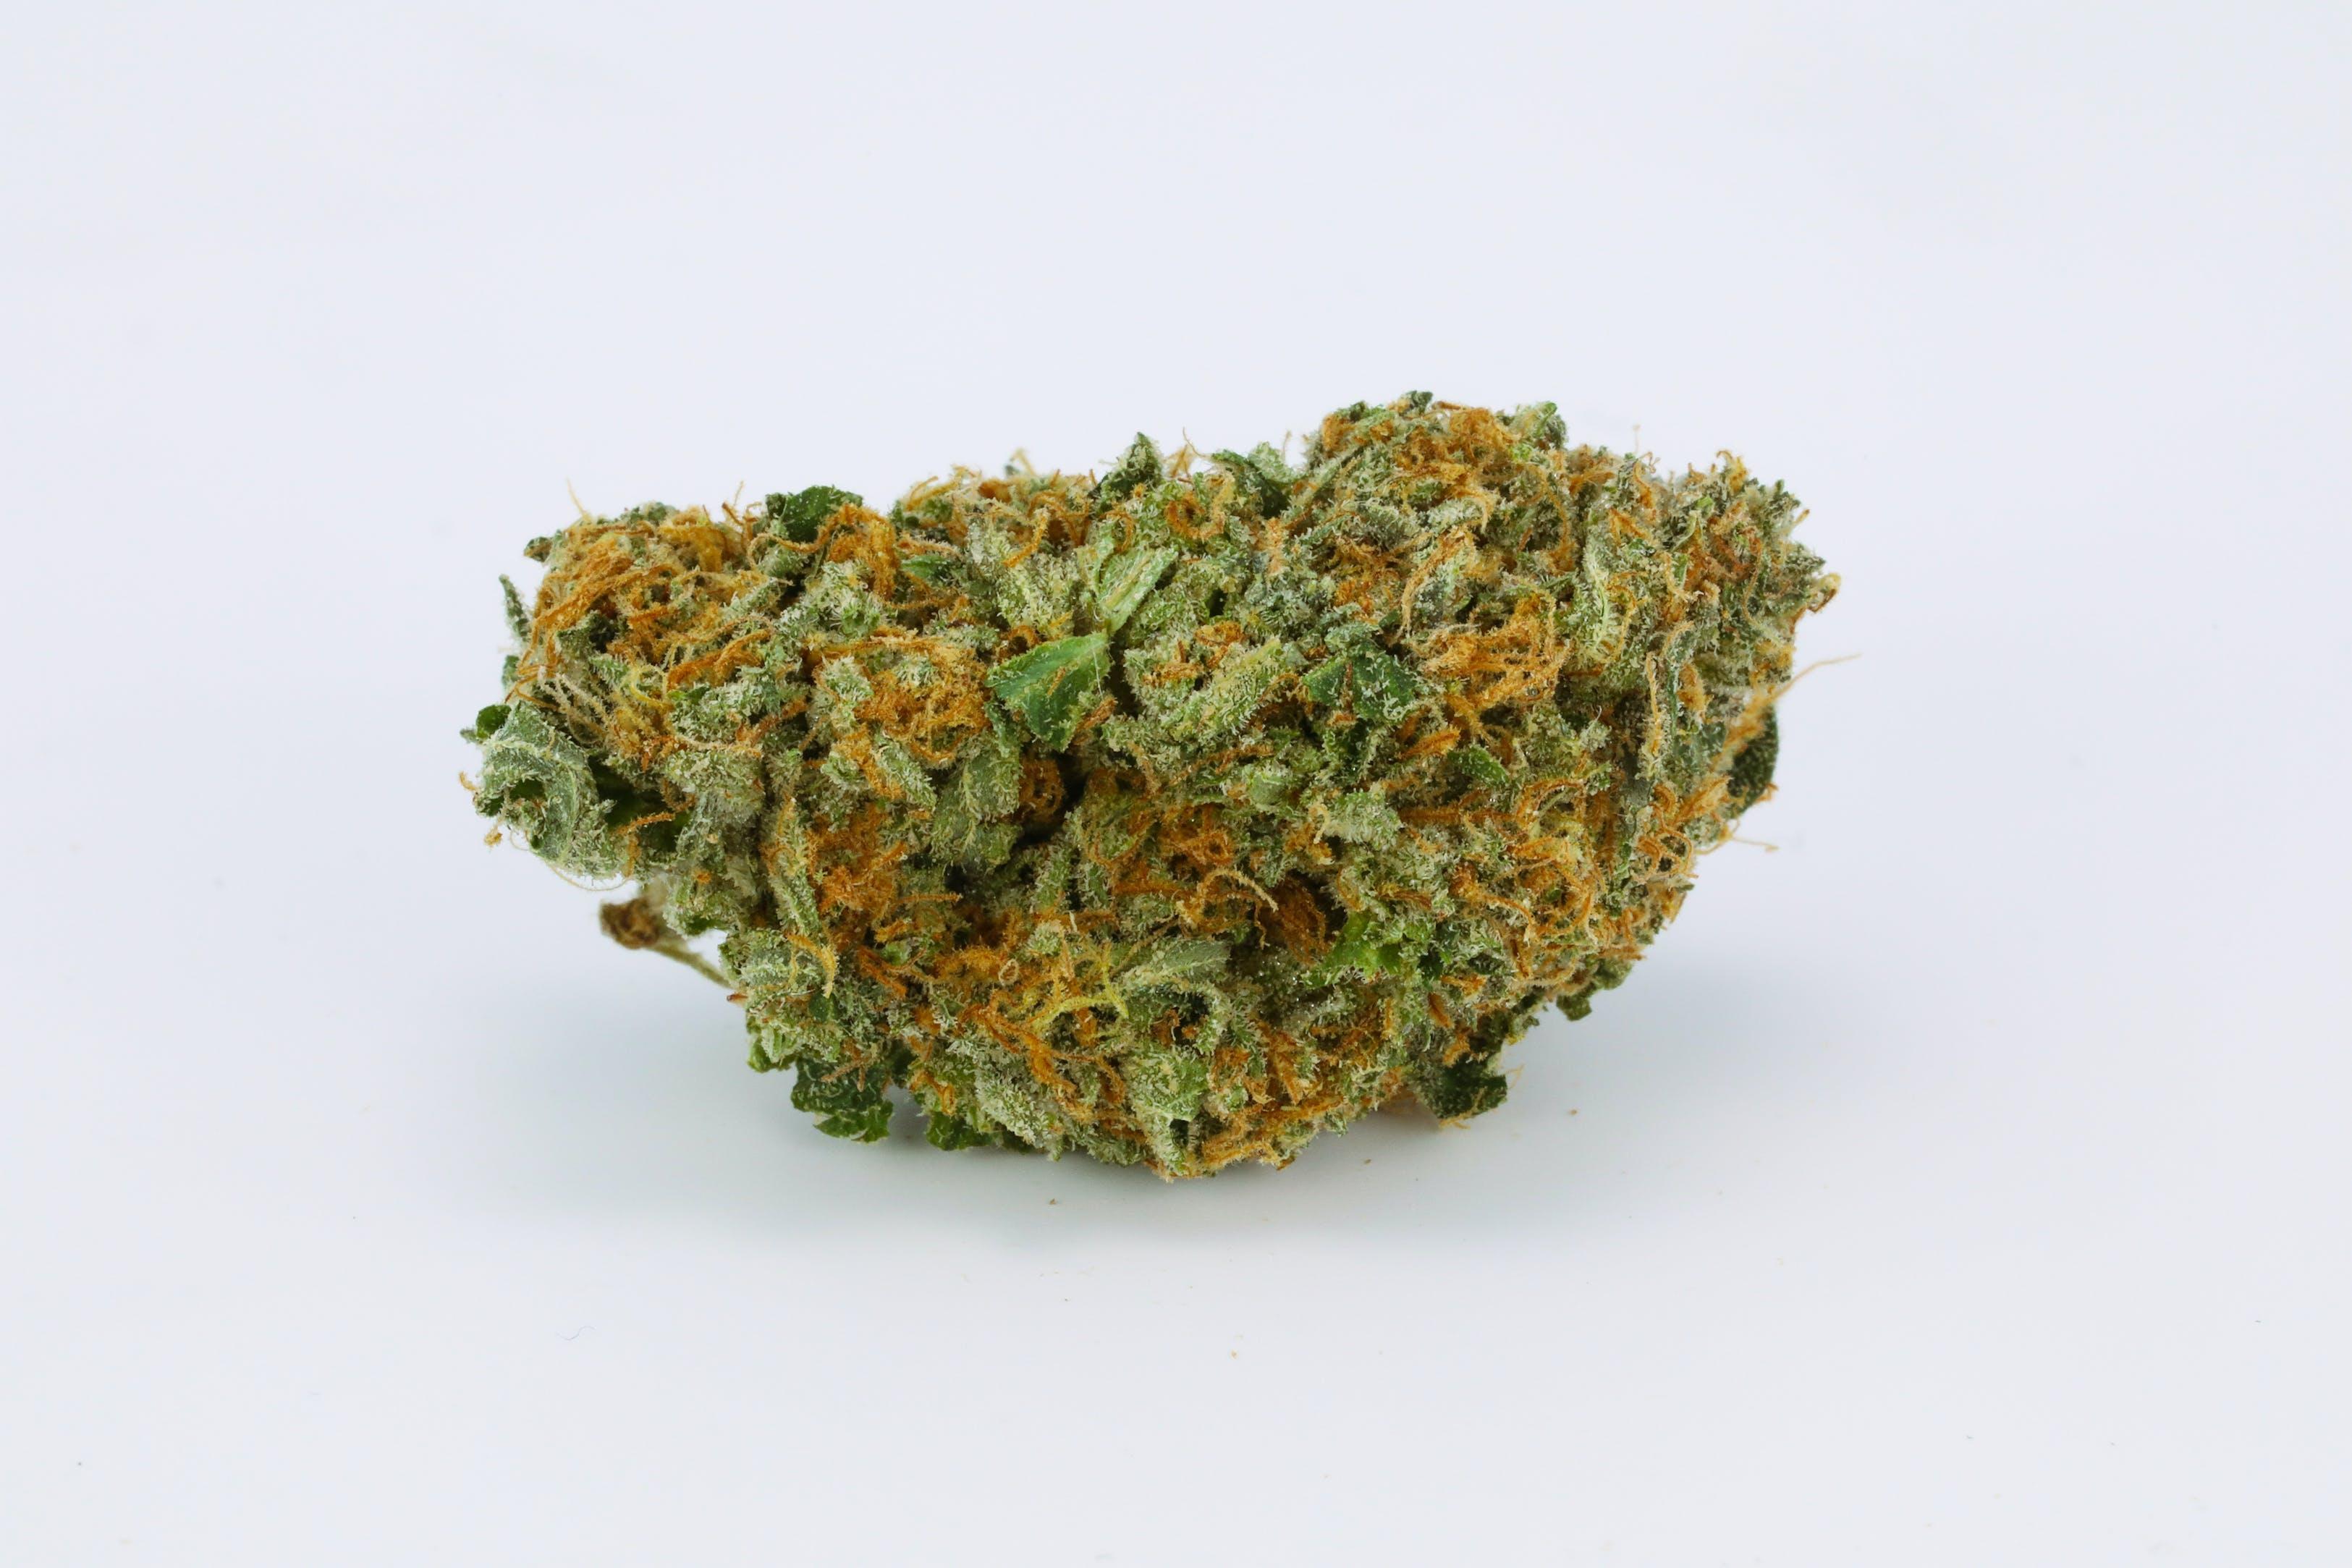 Bubba's Gift Weed; Bubba's Gift Cannabis Strain; Bubba's Gift Indica Marijuana Strain